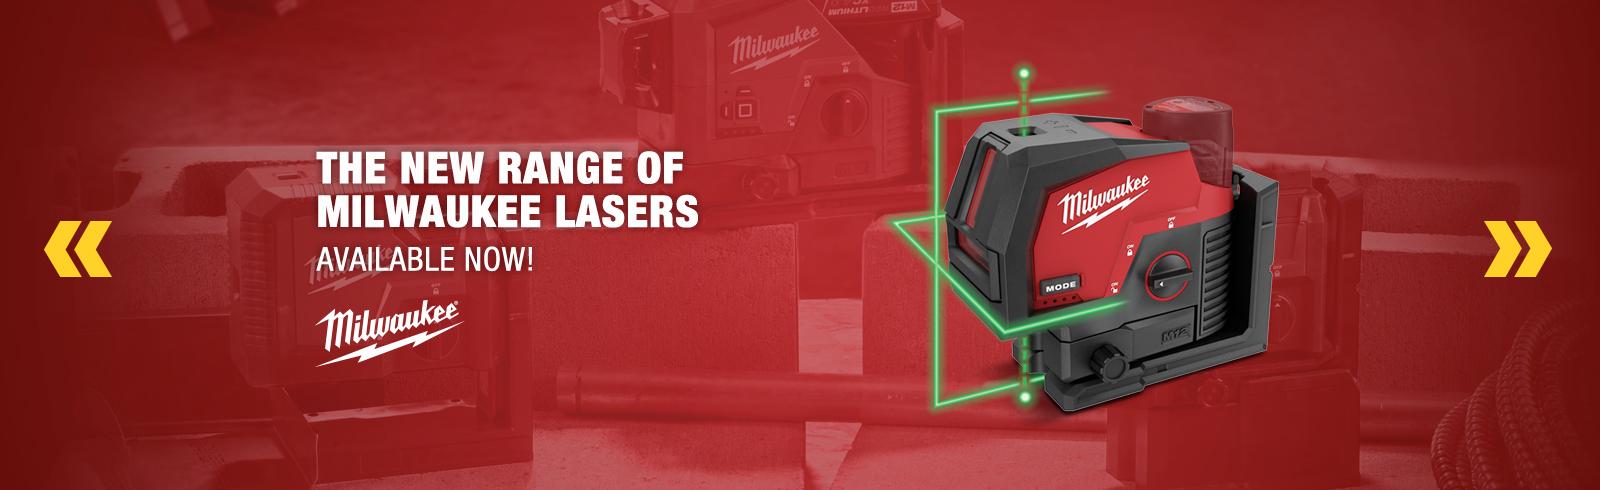 New range of Milwaukee Lasers